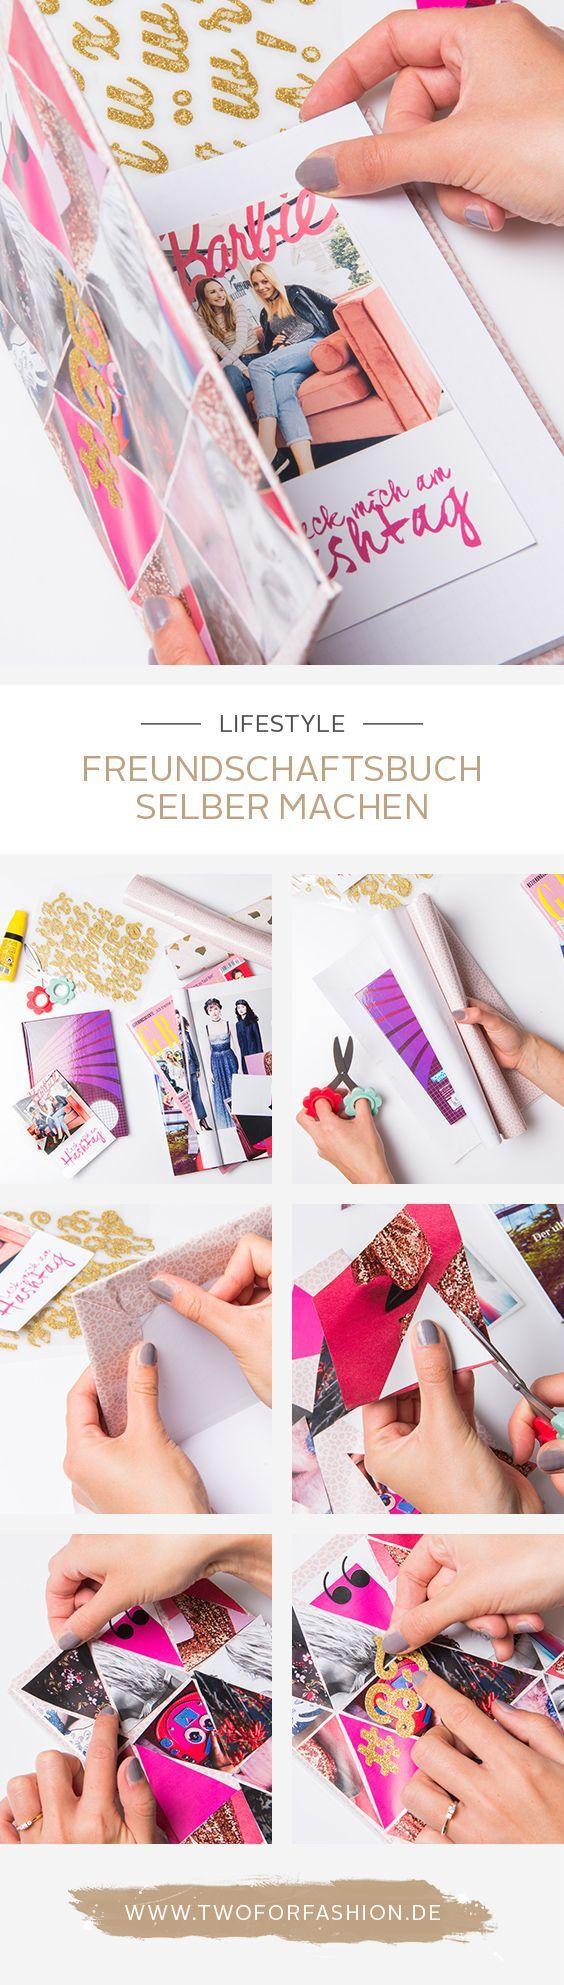 226 best fotogeschenke diy basteln 2 0 images on pinterest creative crafts diy room decor - Fotogeschenke diy ...